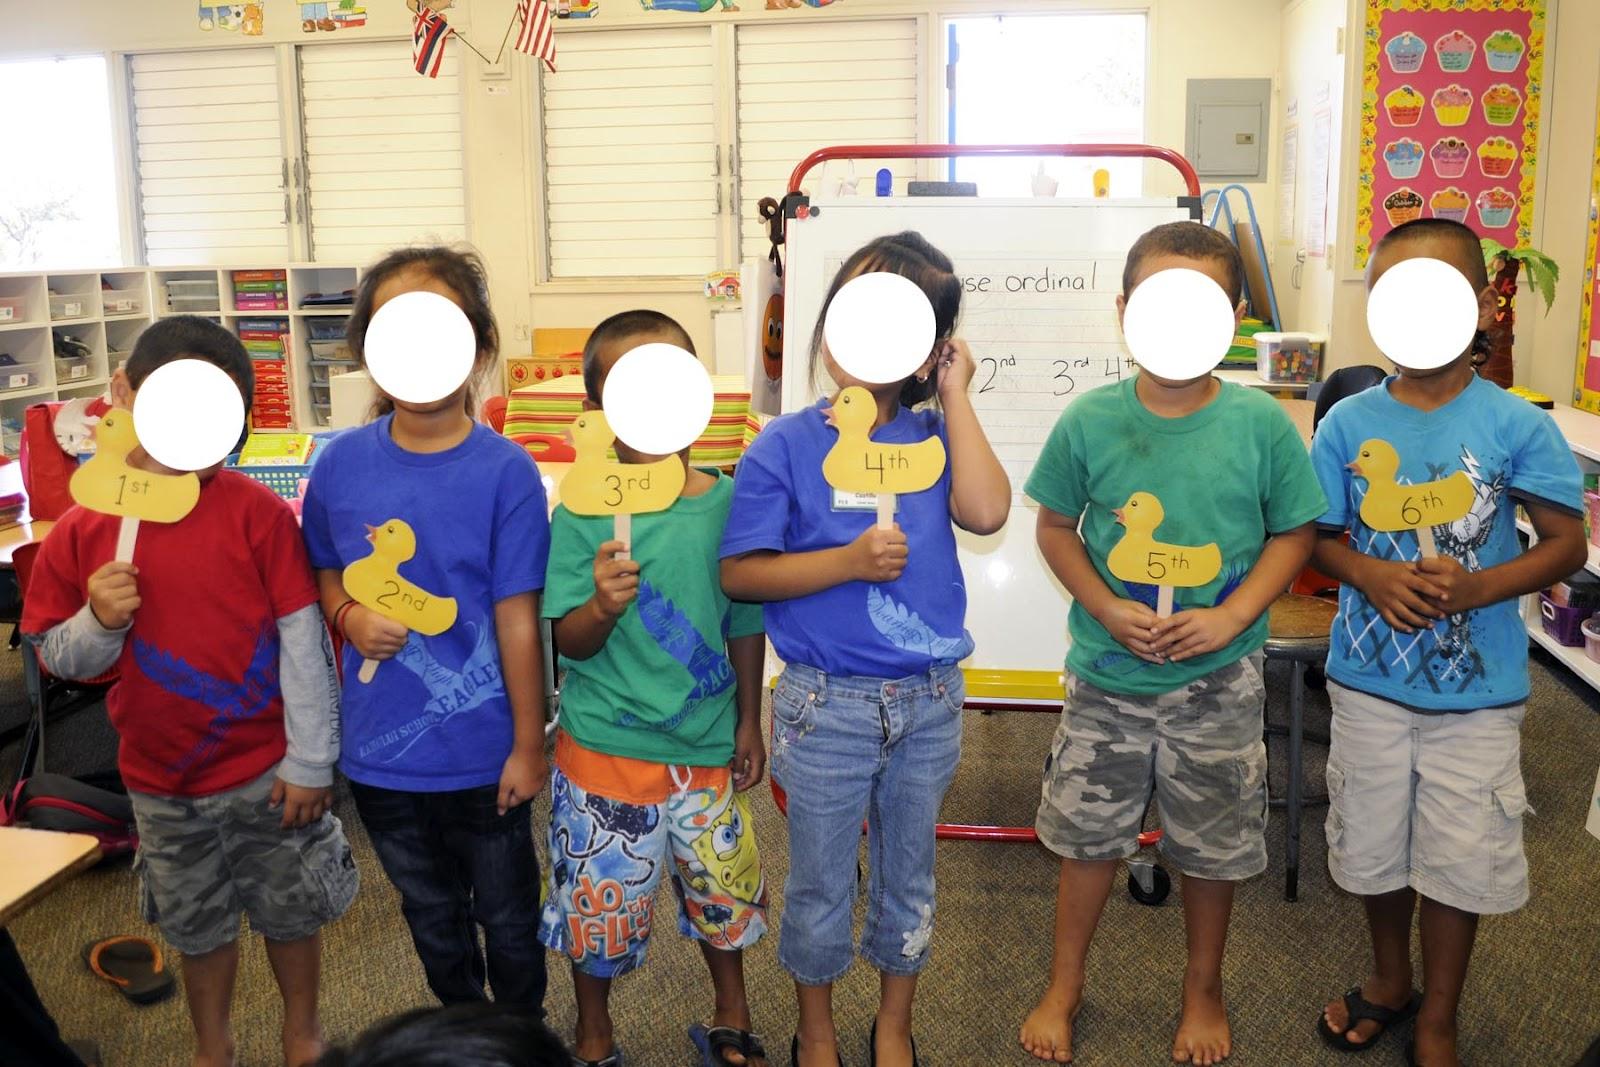 Mrs Ricca S Kindergarten Ordinal Numbers Amp Eric Carle